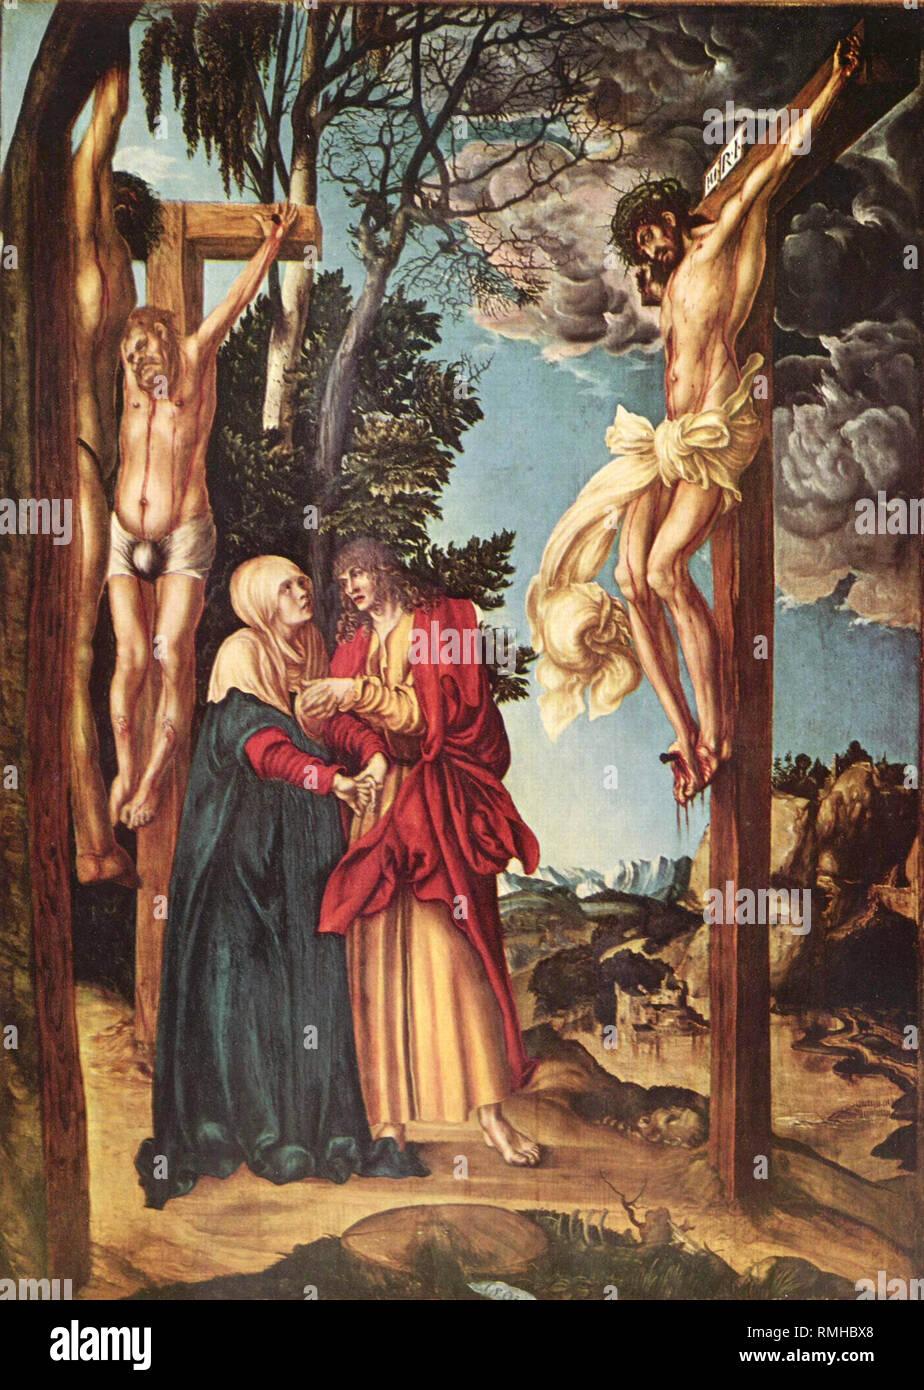 Kreuzigung Christi von Lucas Cranach dem Älteren, 1503 Stockbild